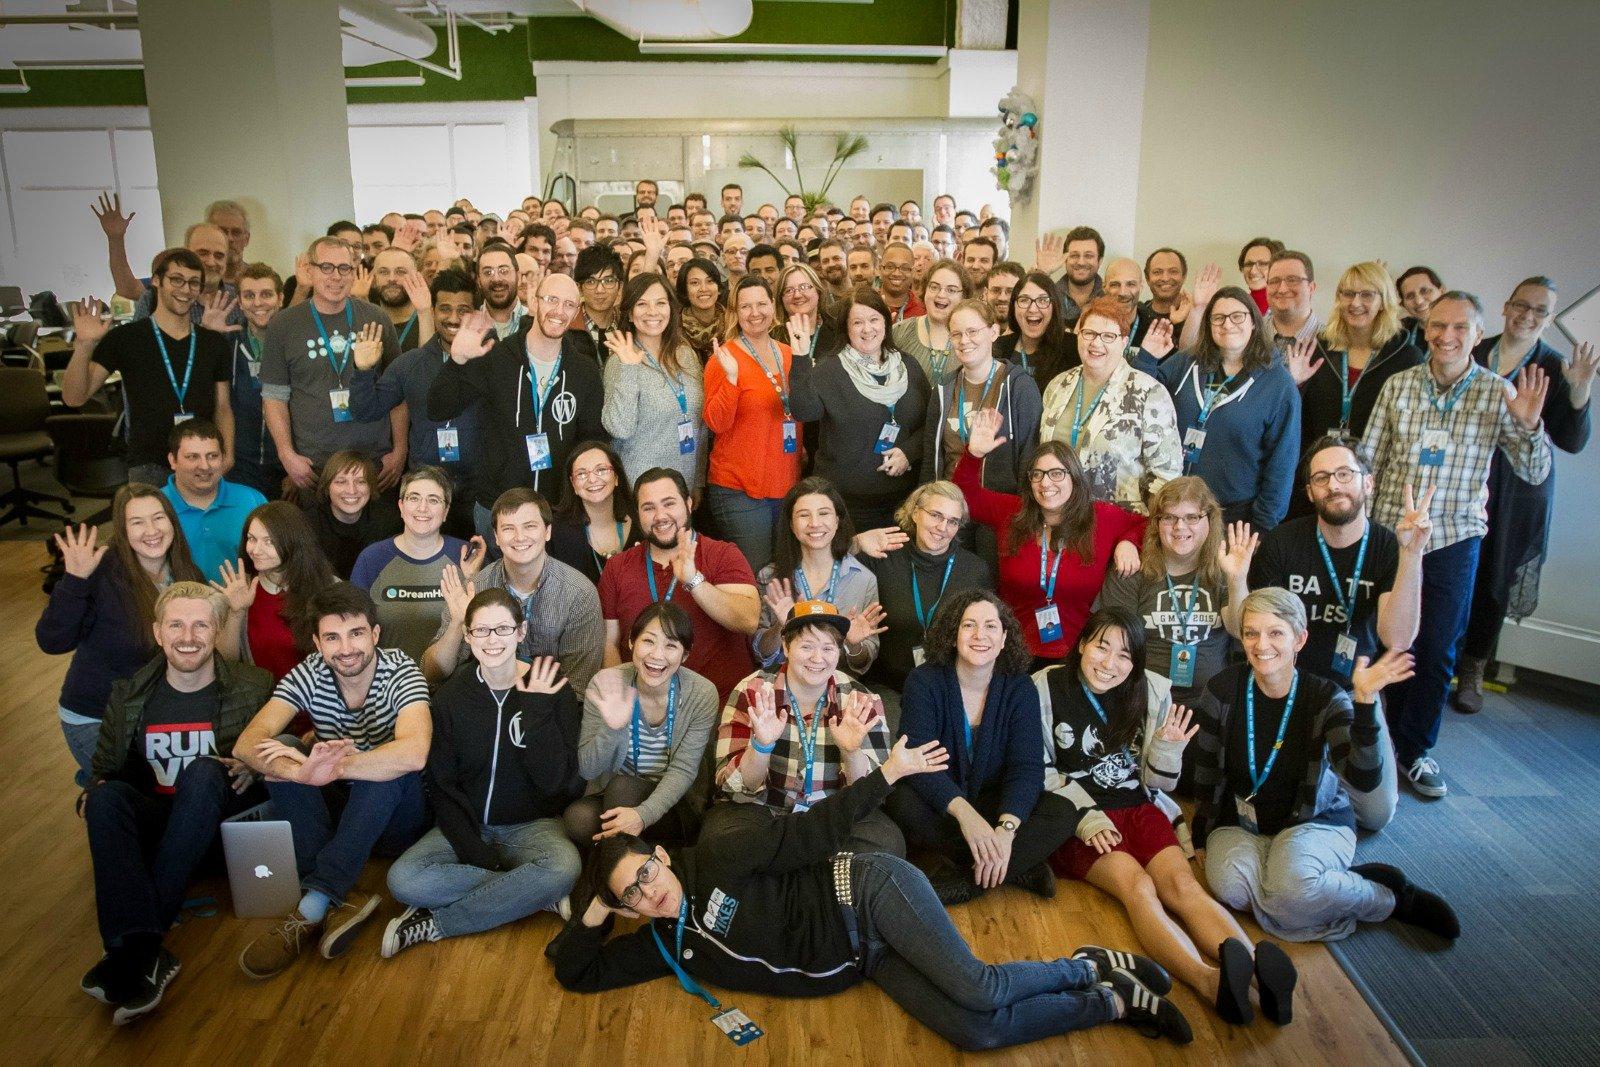 2015 WordCamp US © Kari Leigh Marucchi